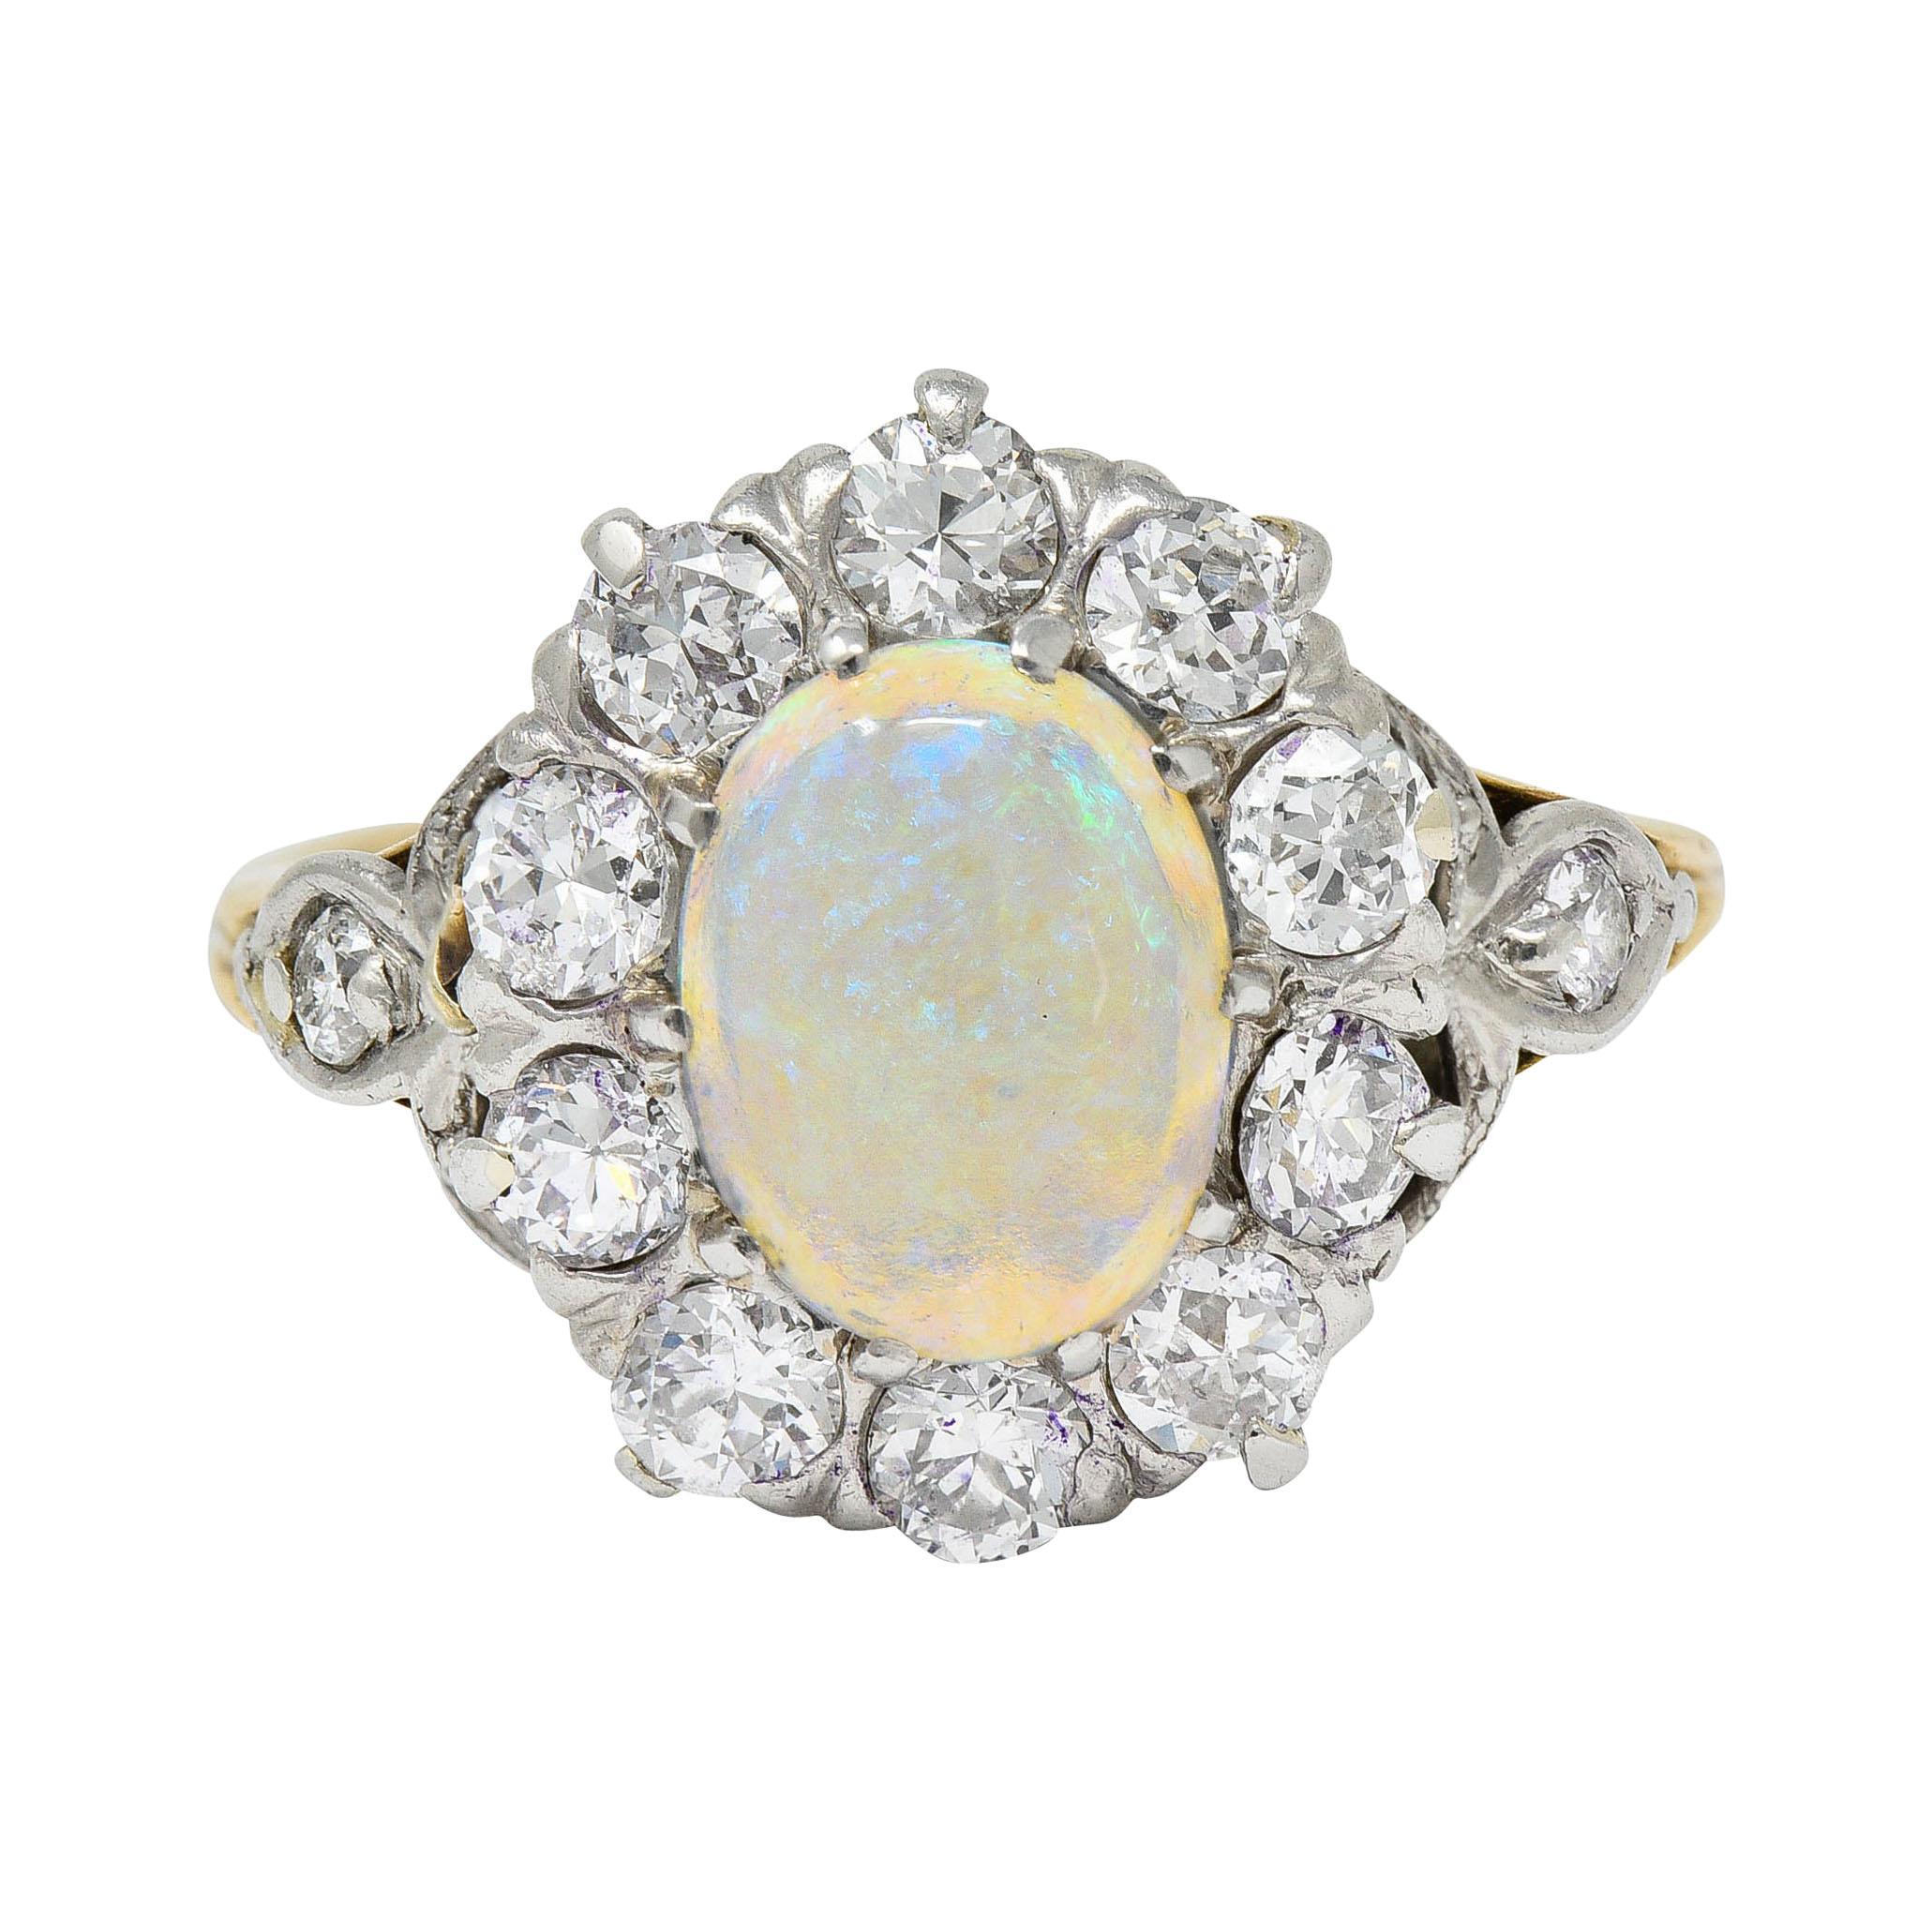 Edwardian Jelly Opal 1.06 Carats Diamond Platinum 14 Karat Gold Cluster Ring